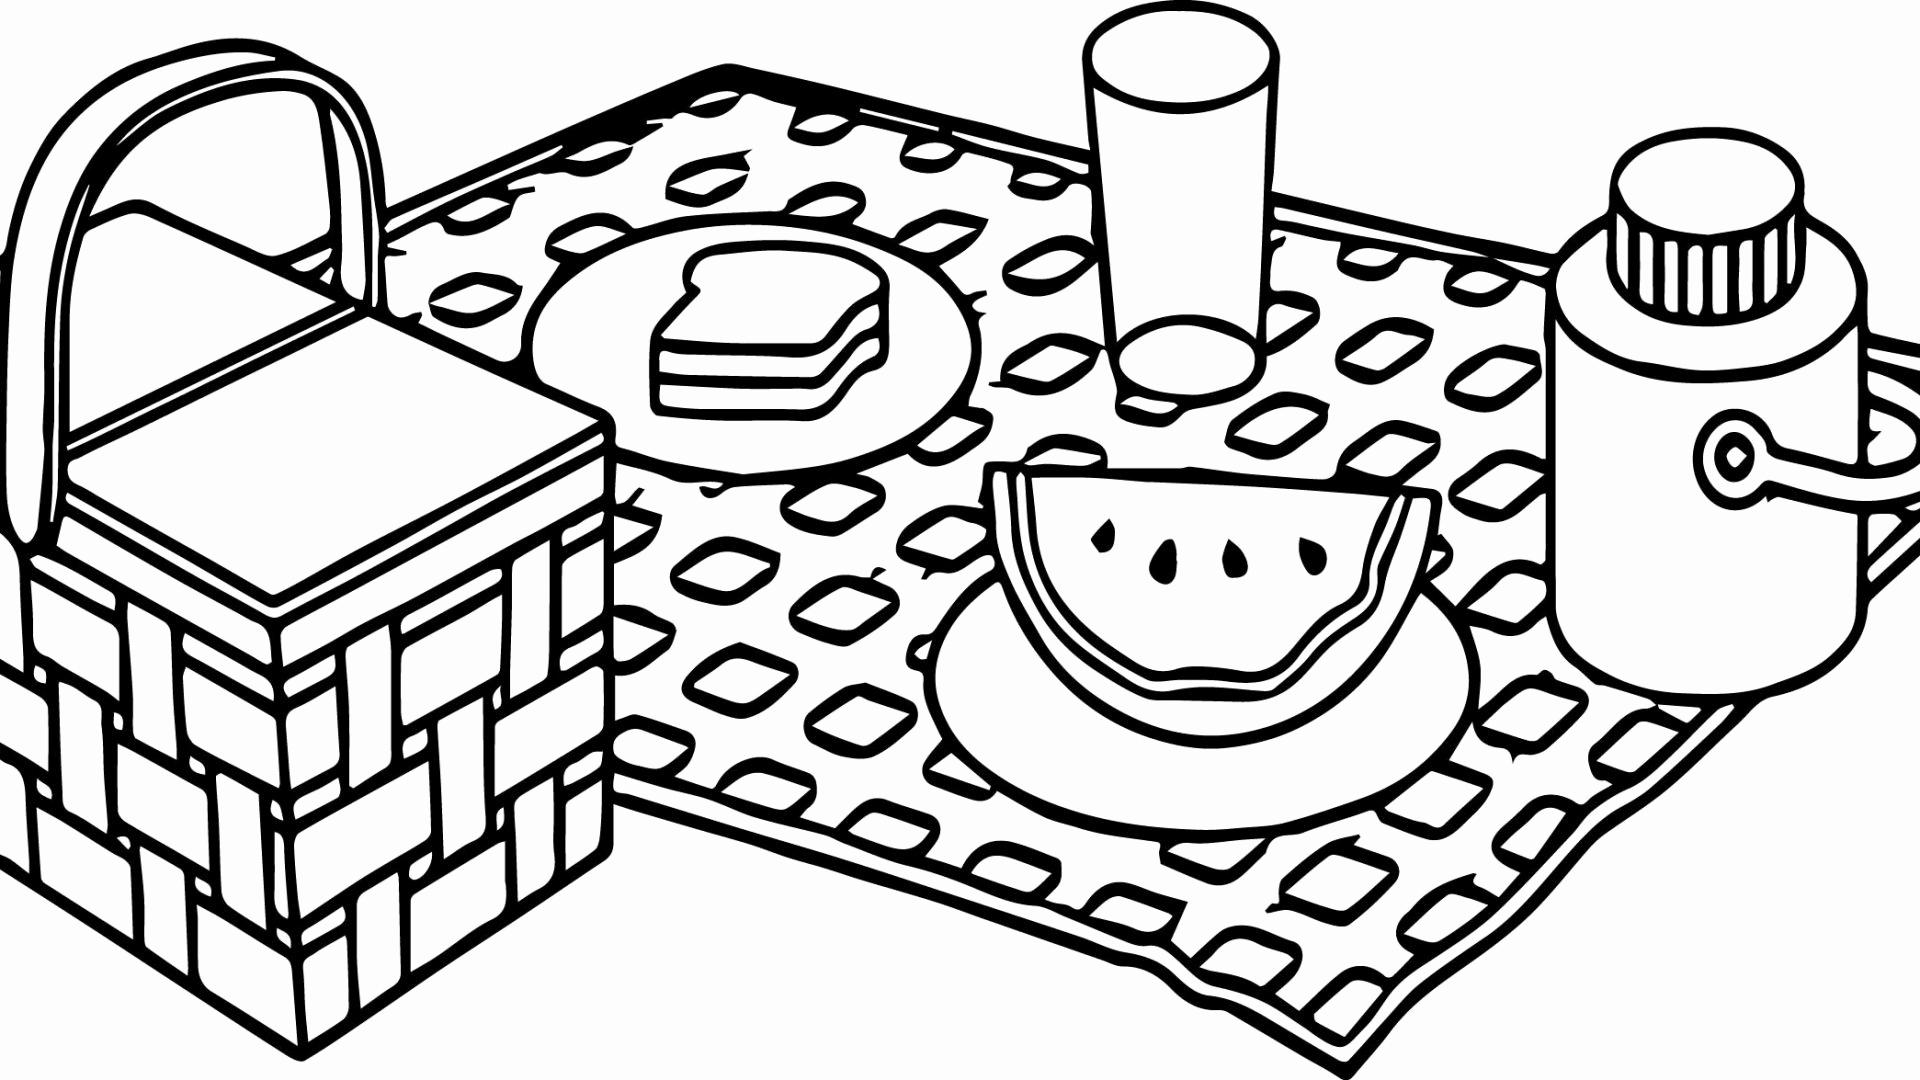 1920x1080 Food Pyramid Coloring Page Beautiful Modern Coloring Book Food